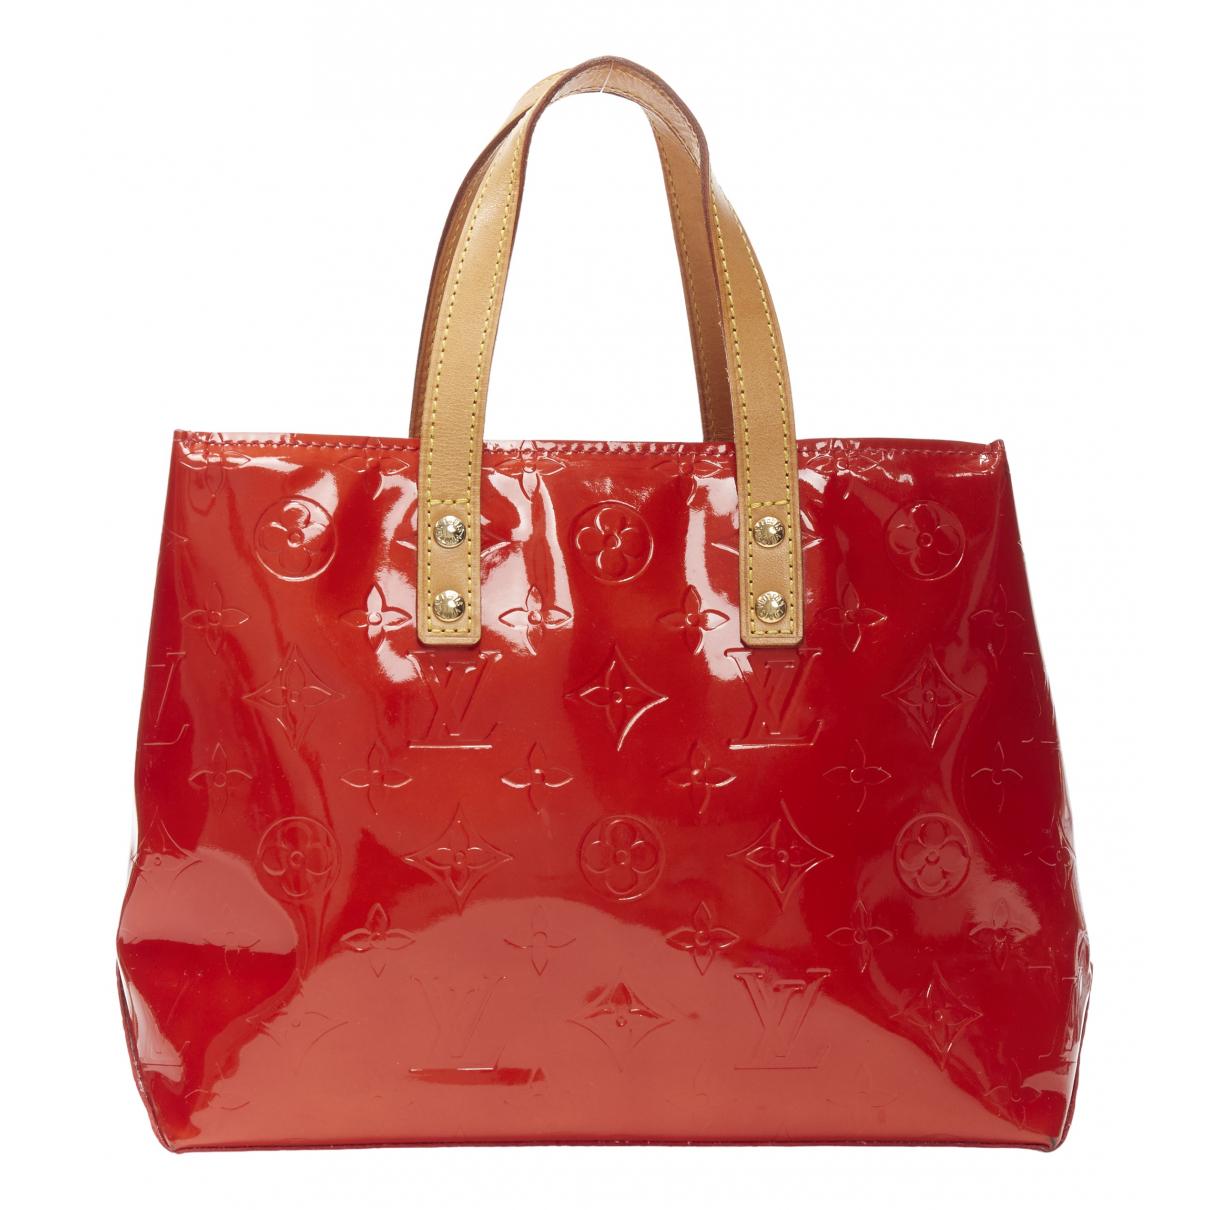 Louis Vuitton Reade Handtasche in  Rot Lackleder